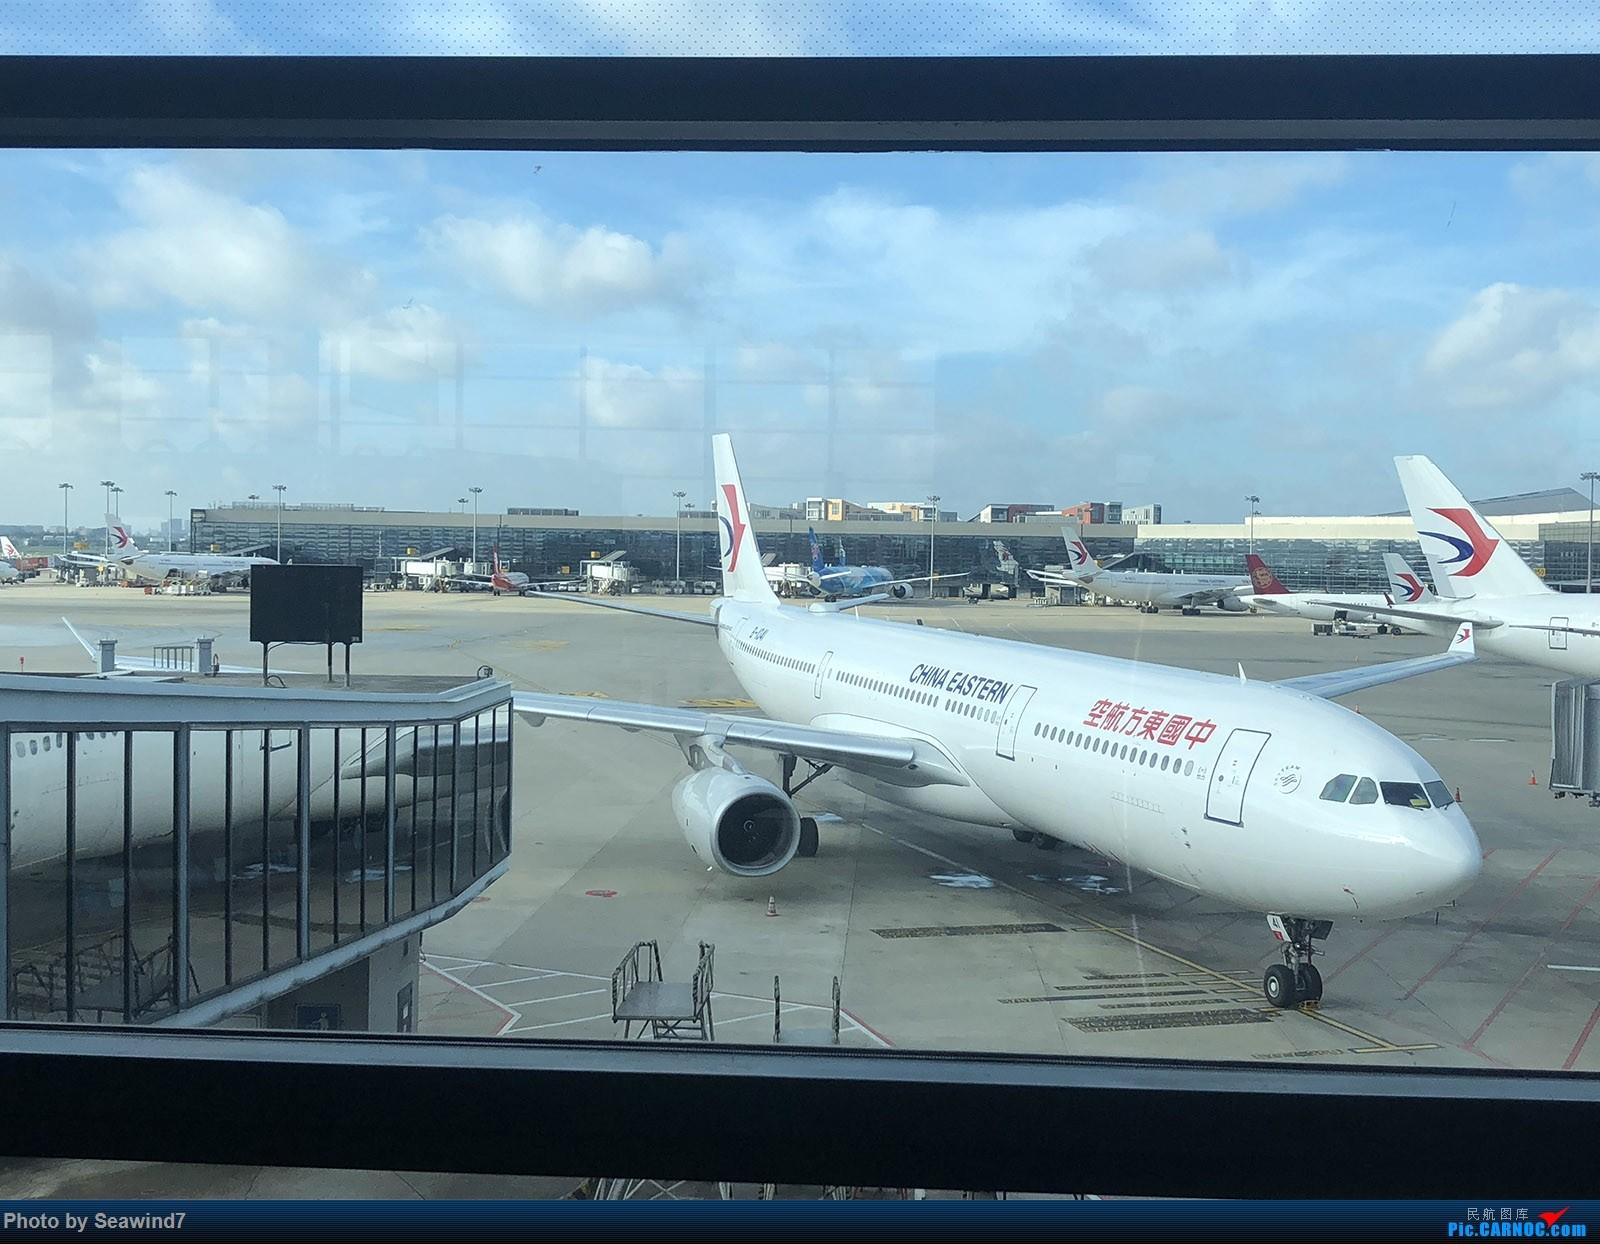 Re:[原创]东航第一架字母机/第二架320neo乘坐记 AIRBUS A330-300 B-1041 中国上海虹桥国际机场